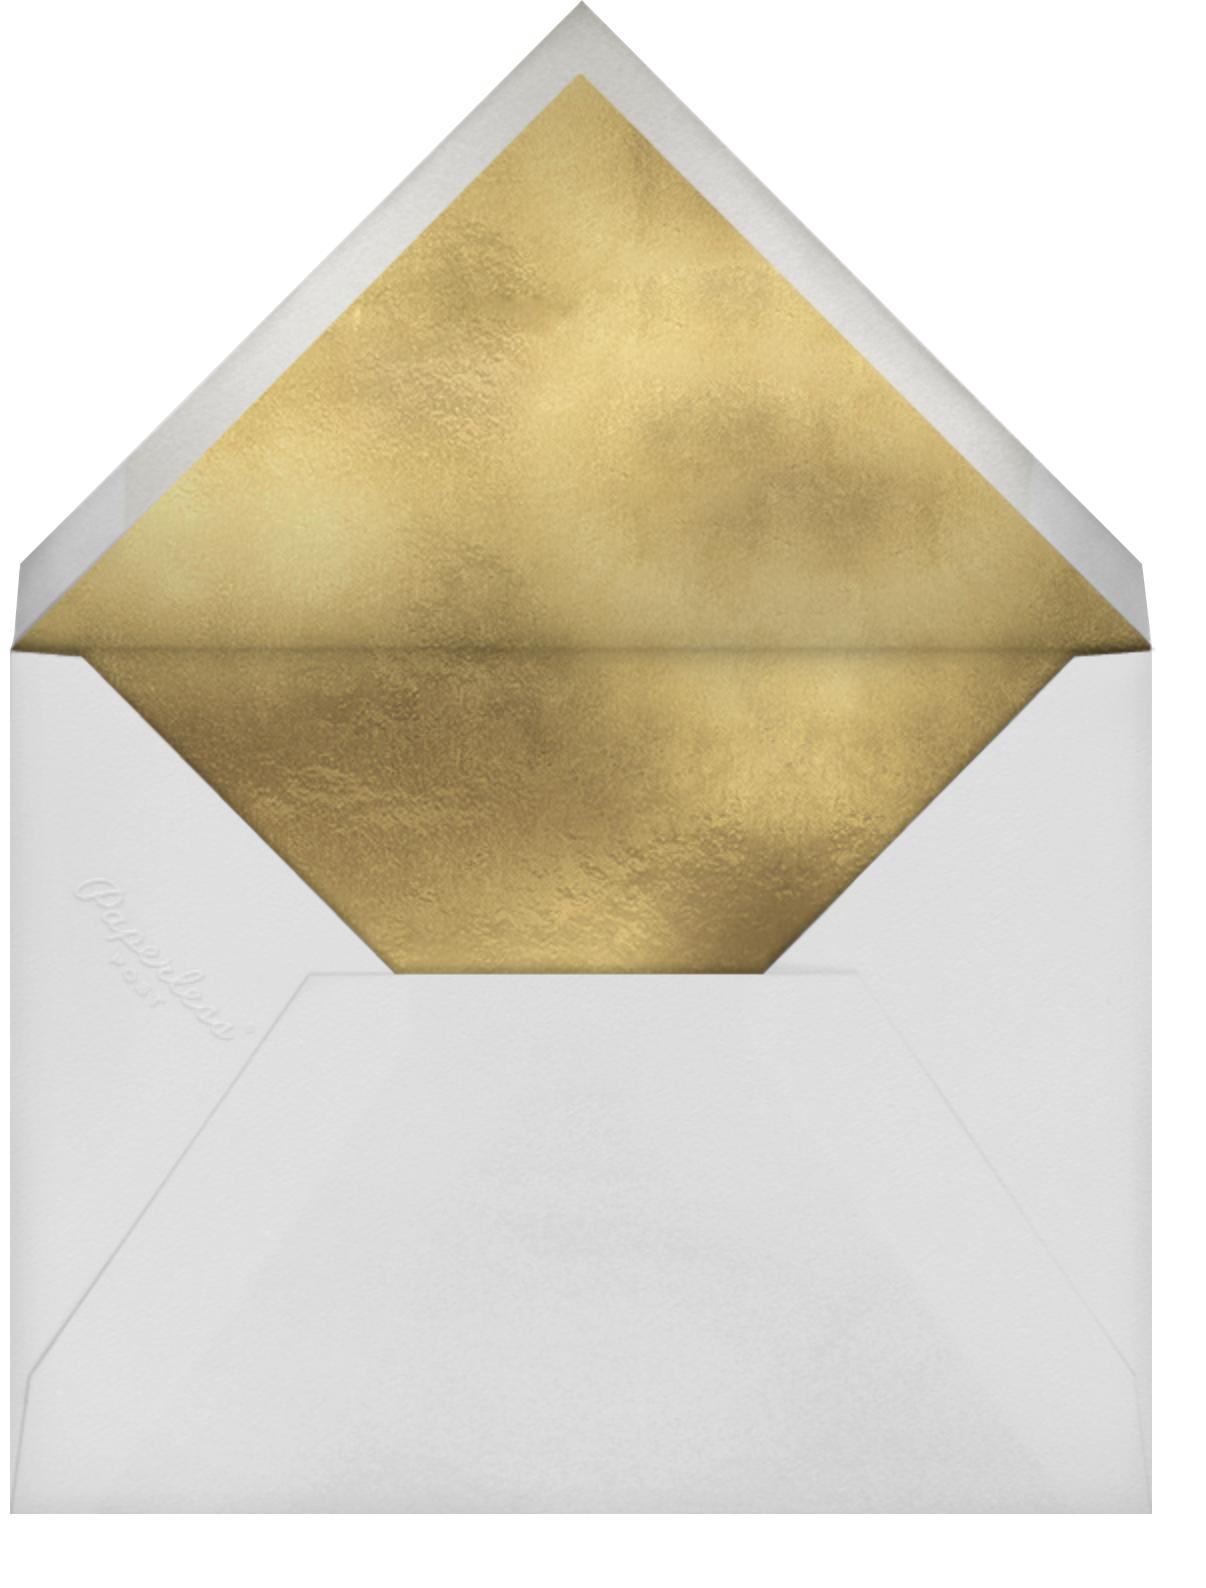 Penrose - Jonathan Adler - Professional events - envelope back